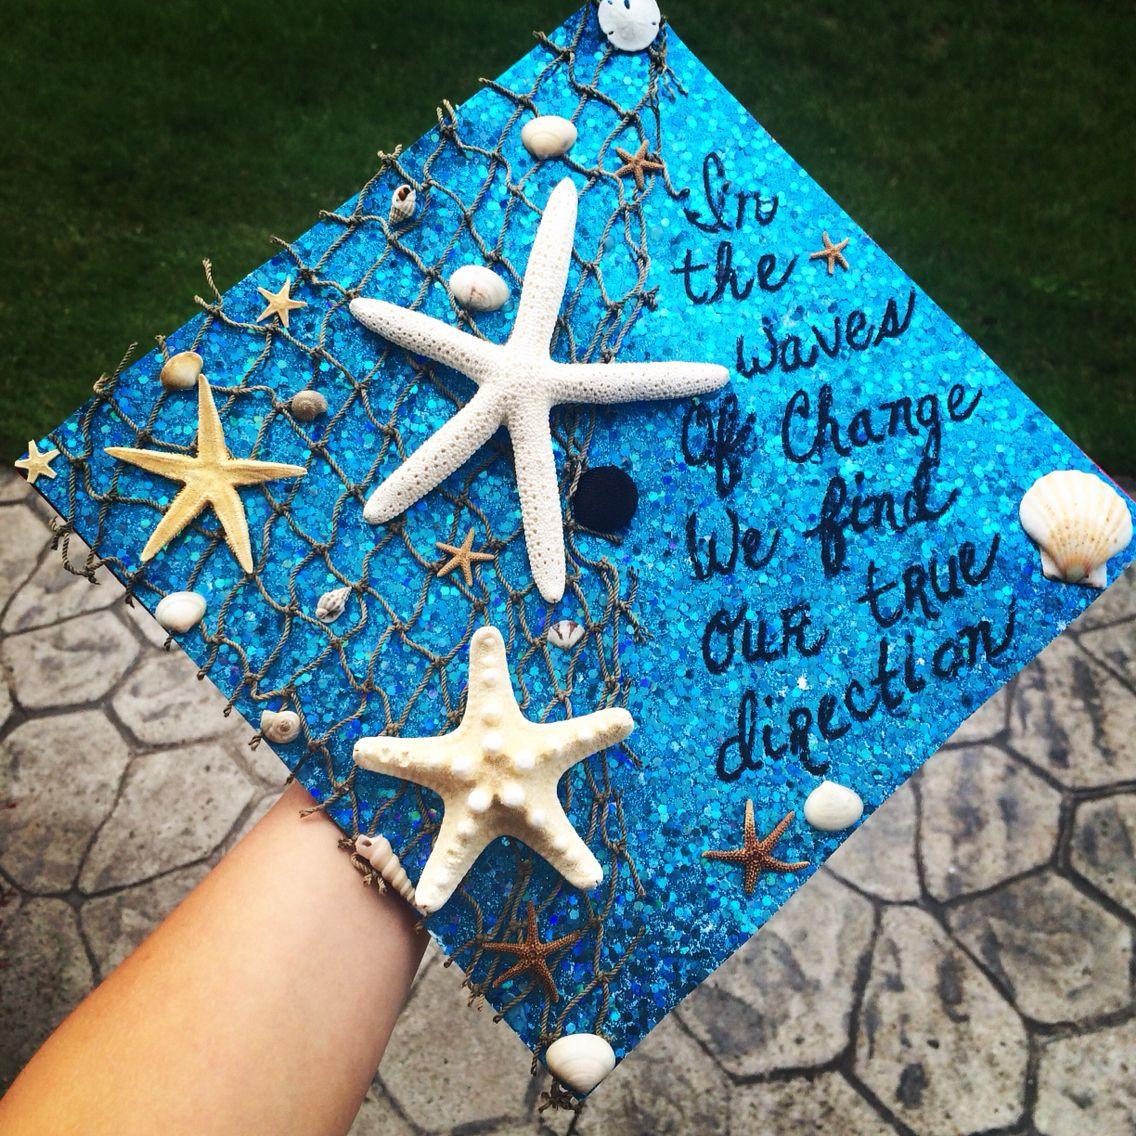 interior design ndsu - 1000+ images about Graduation ap Ideas ound 2 ✌ on Pinterest ...